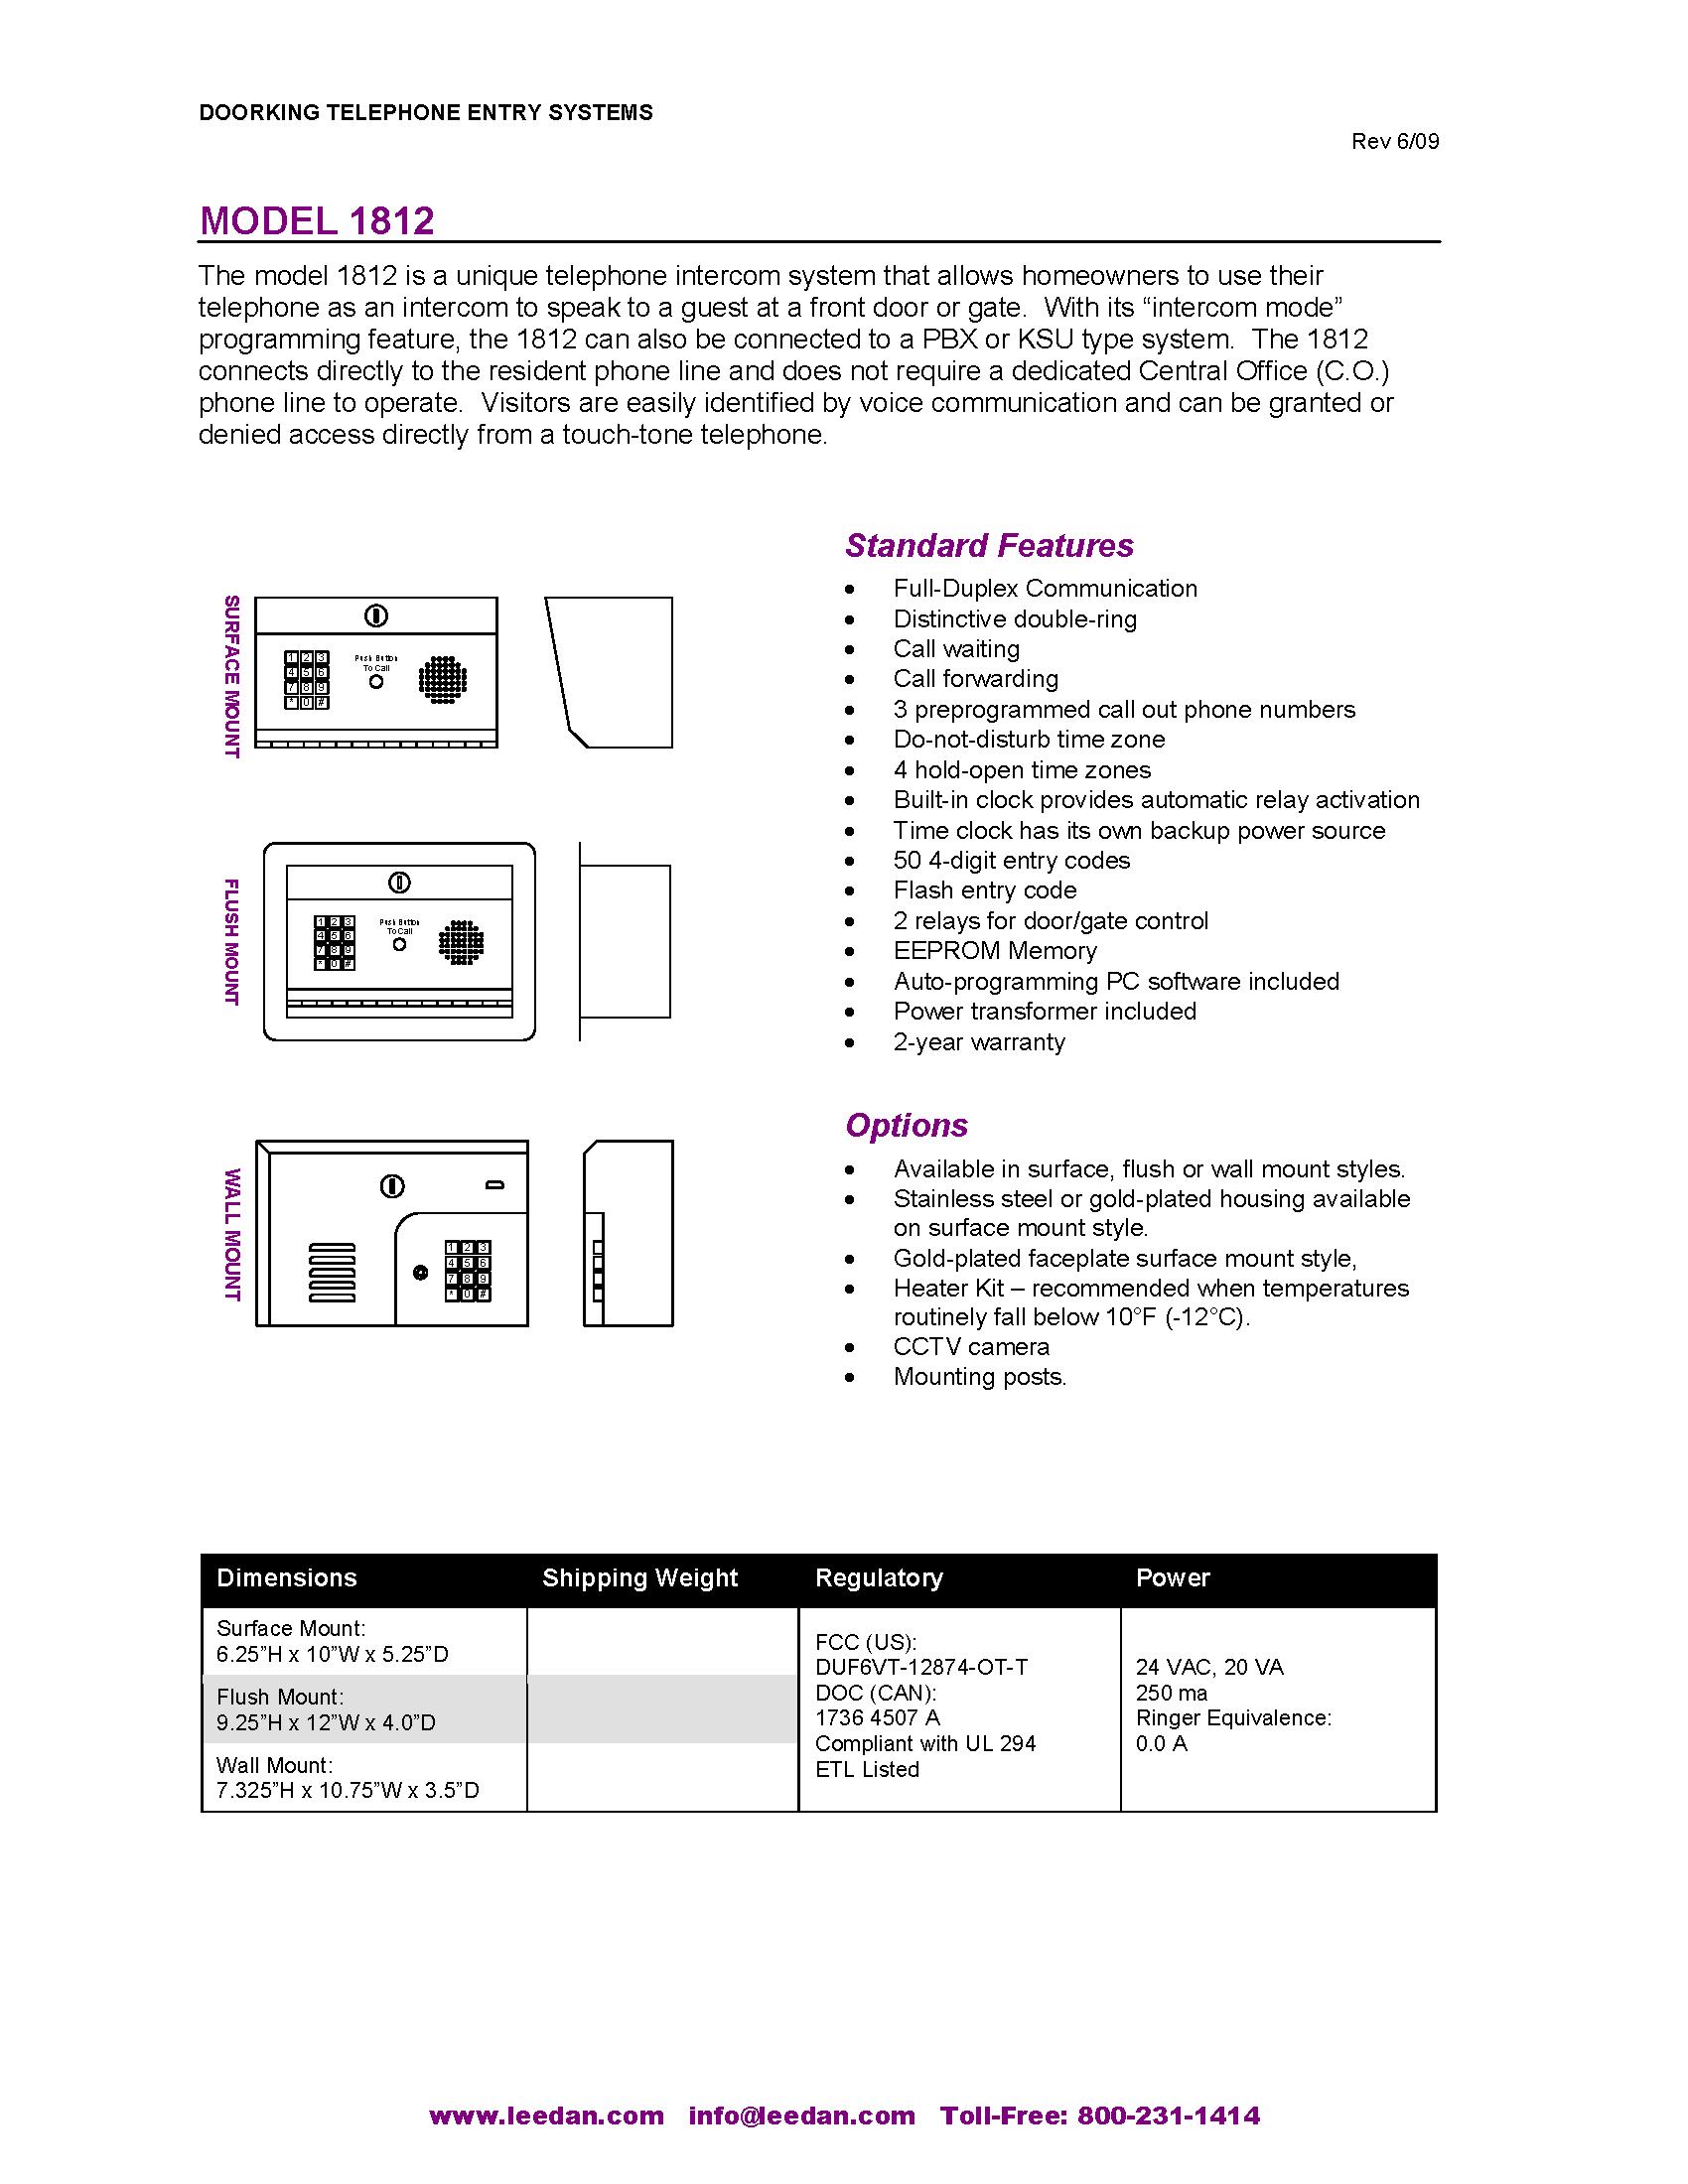 1812 Brochure · DoorKing 1812 Spec Sheet  sc 1 st  Lee Dan & Doorking 1812 Telephone Intercom Entry Residential System Panel